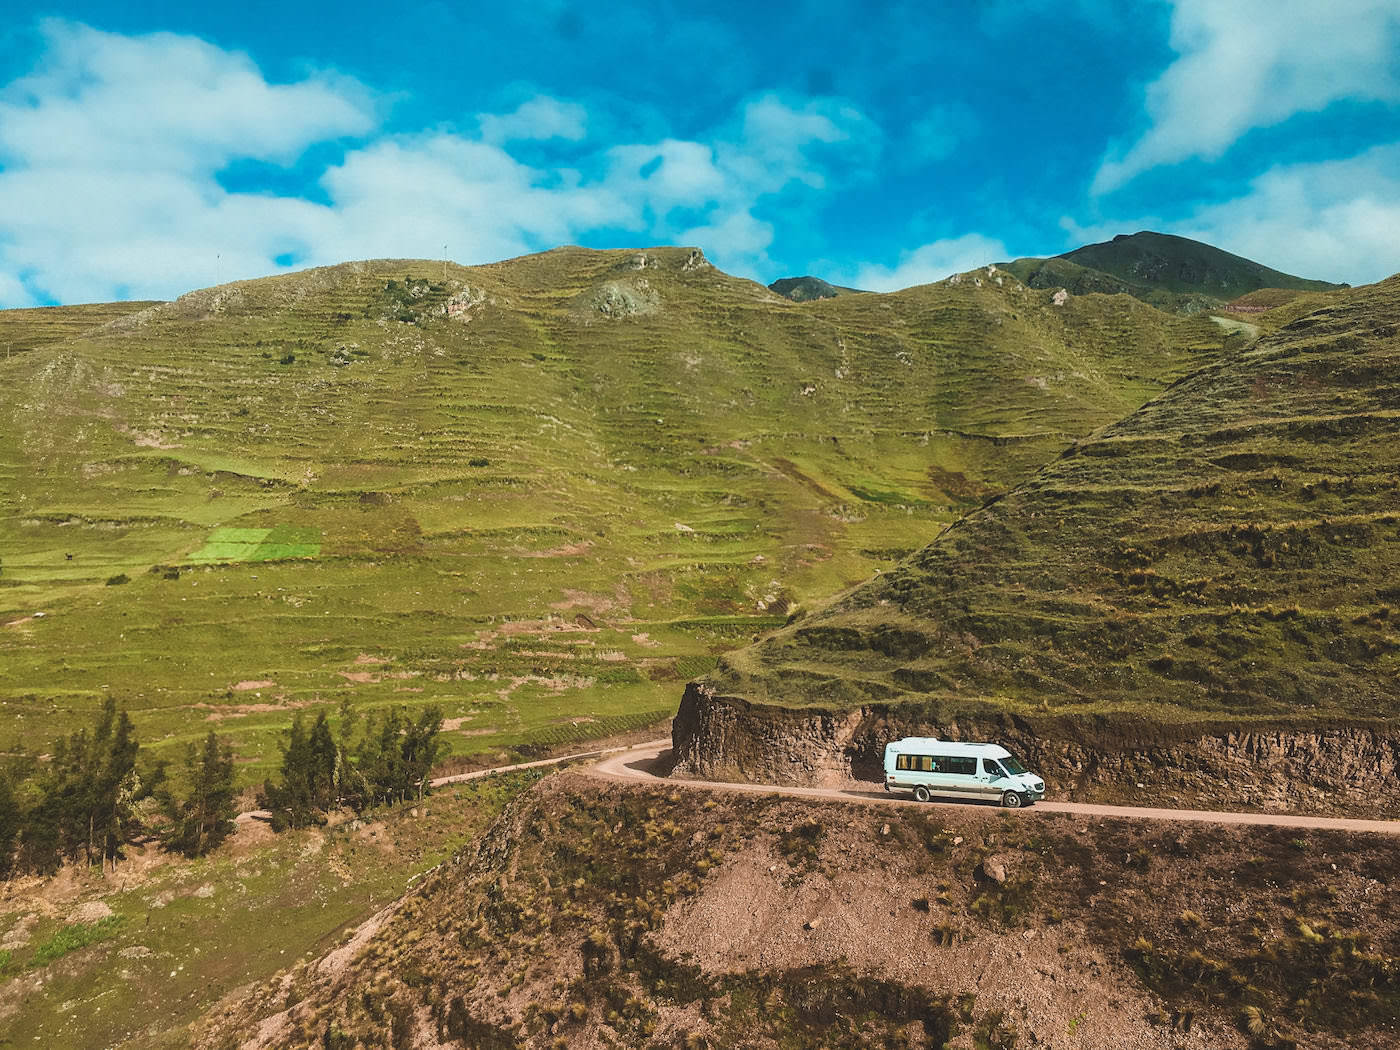 Samochód na krętej drodze w górach